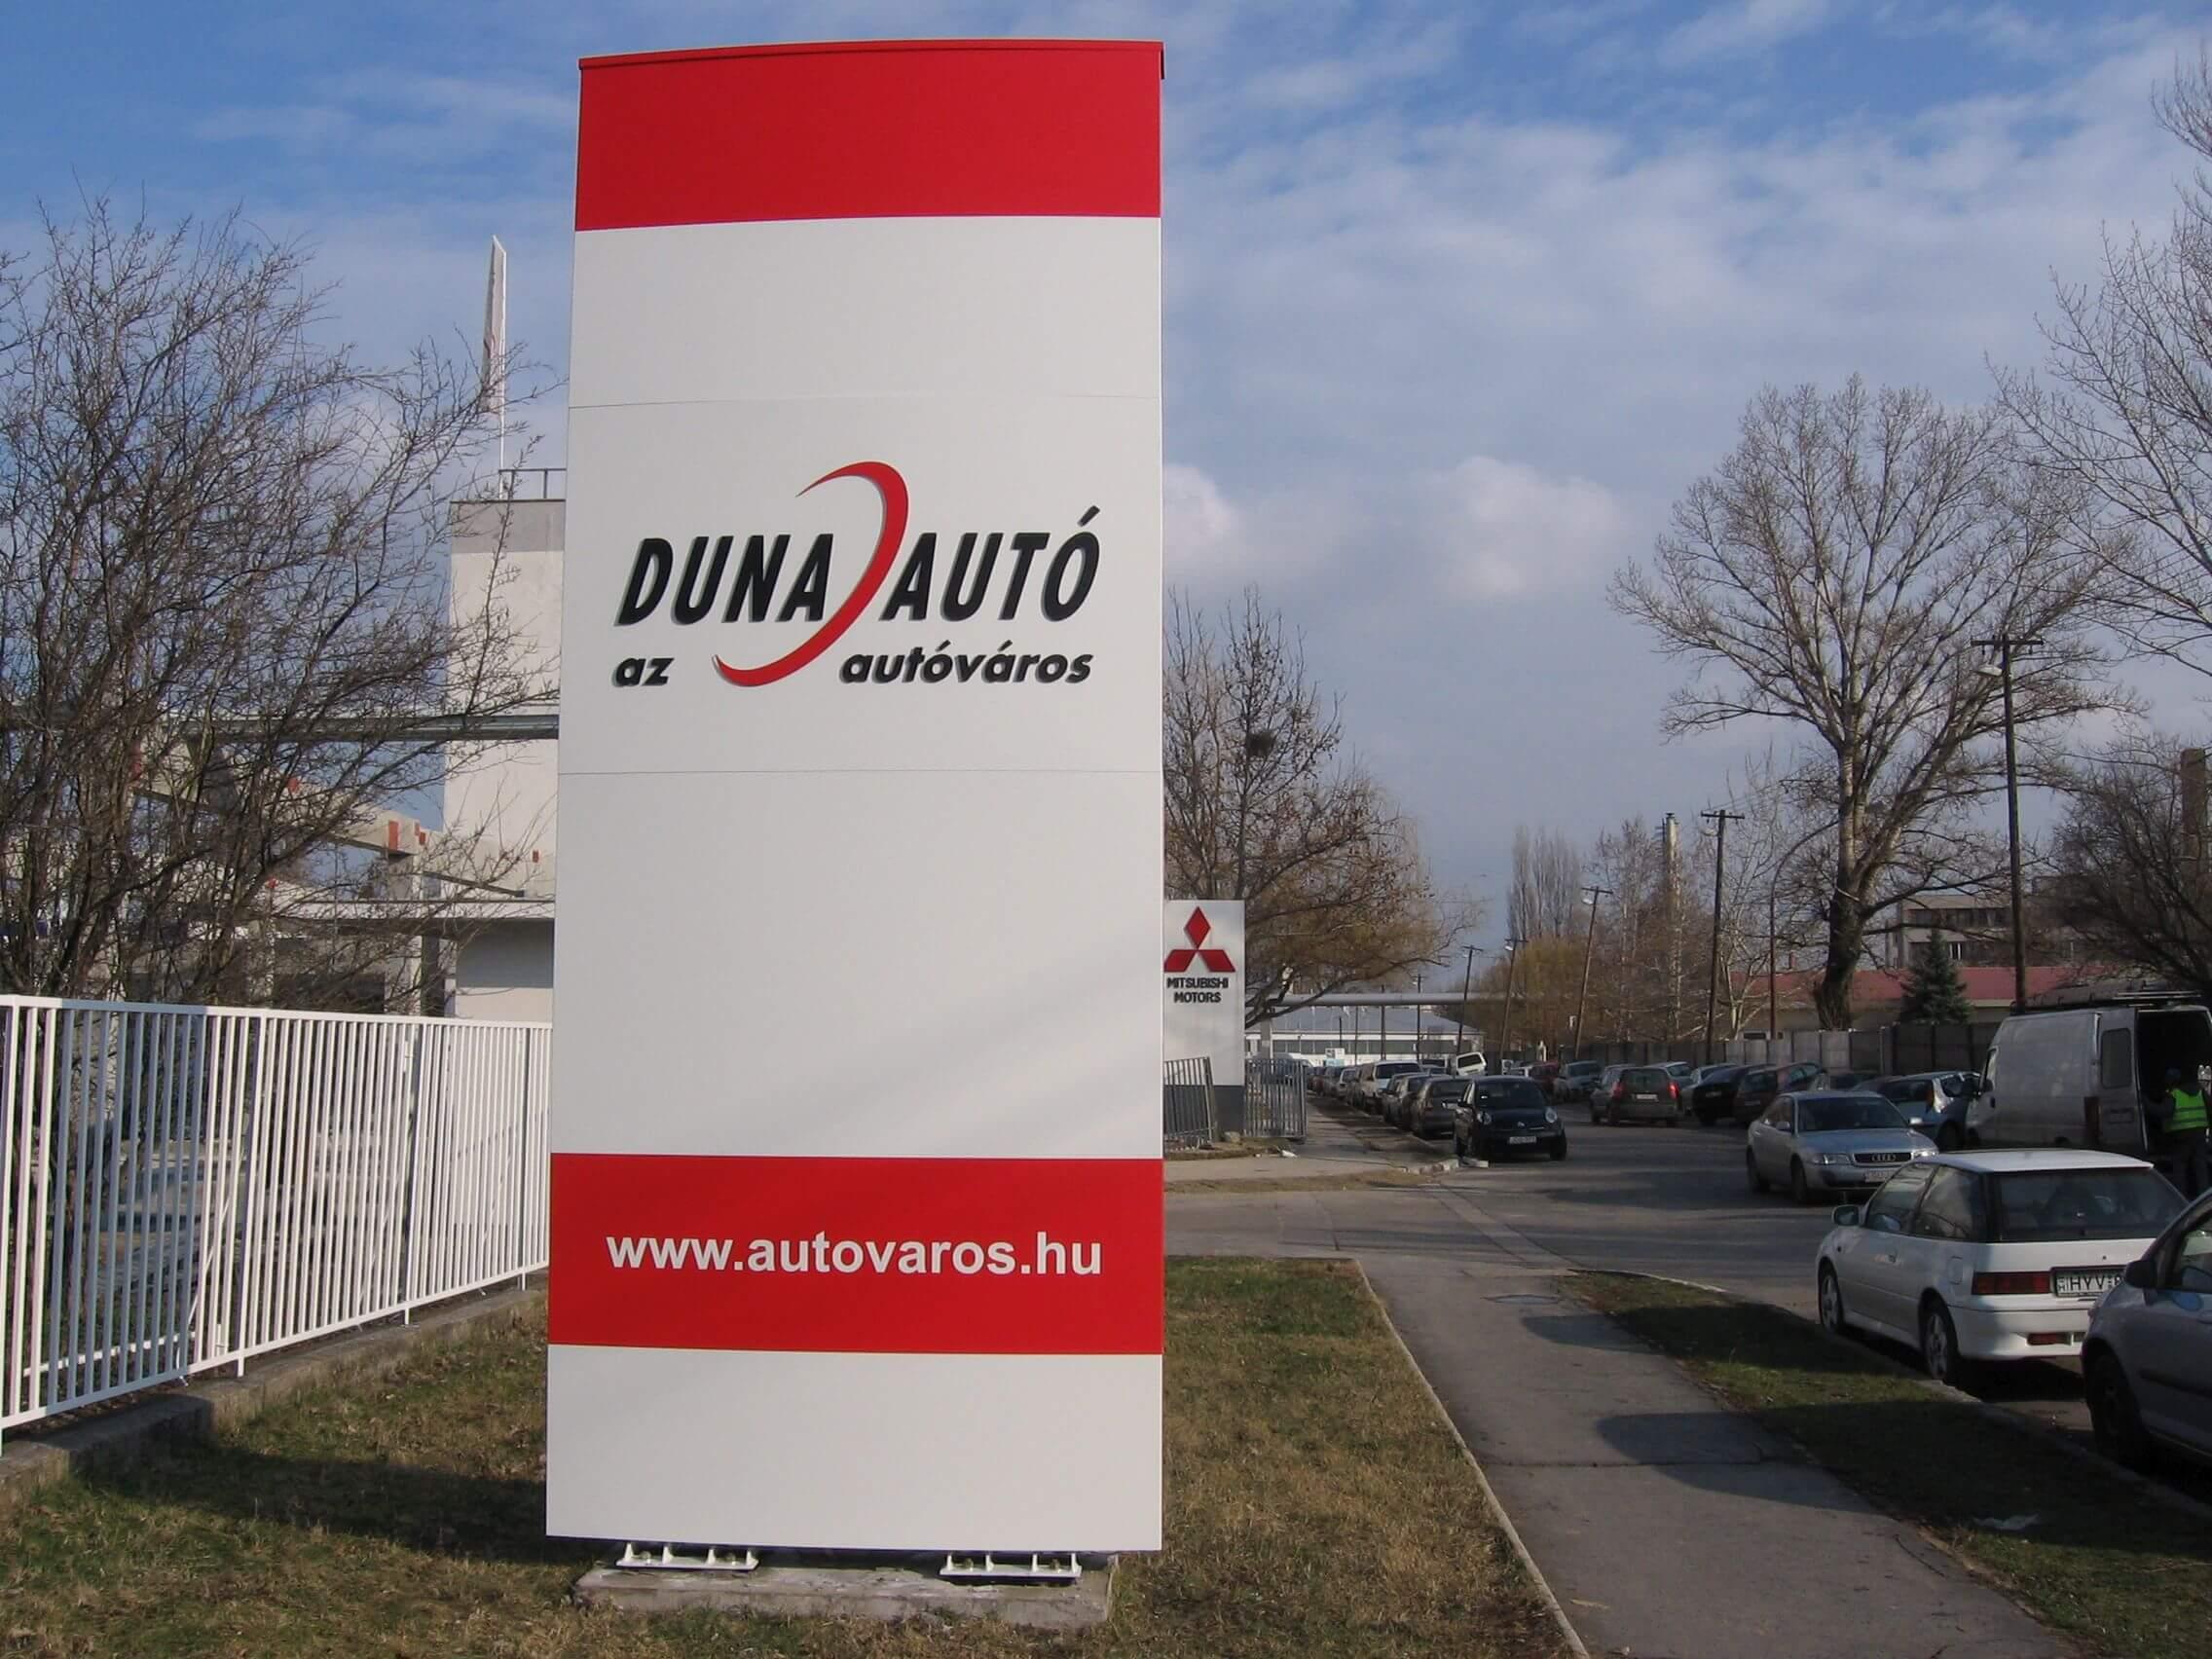 Totemoszlop - Duna autó